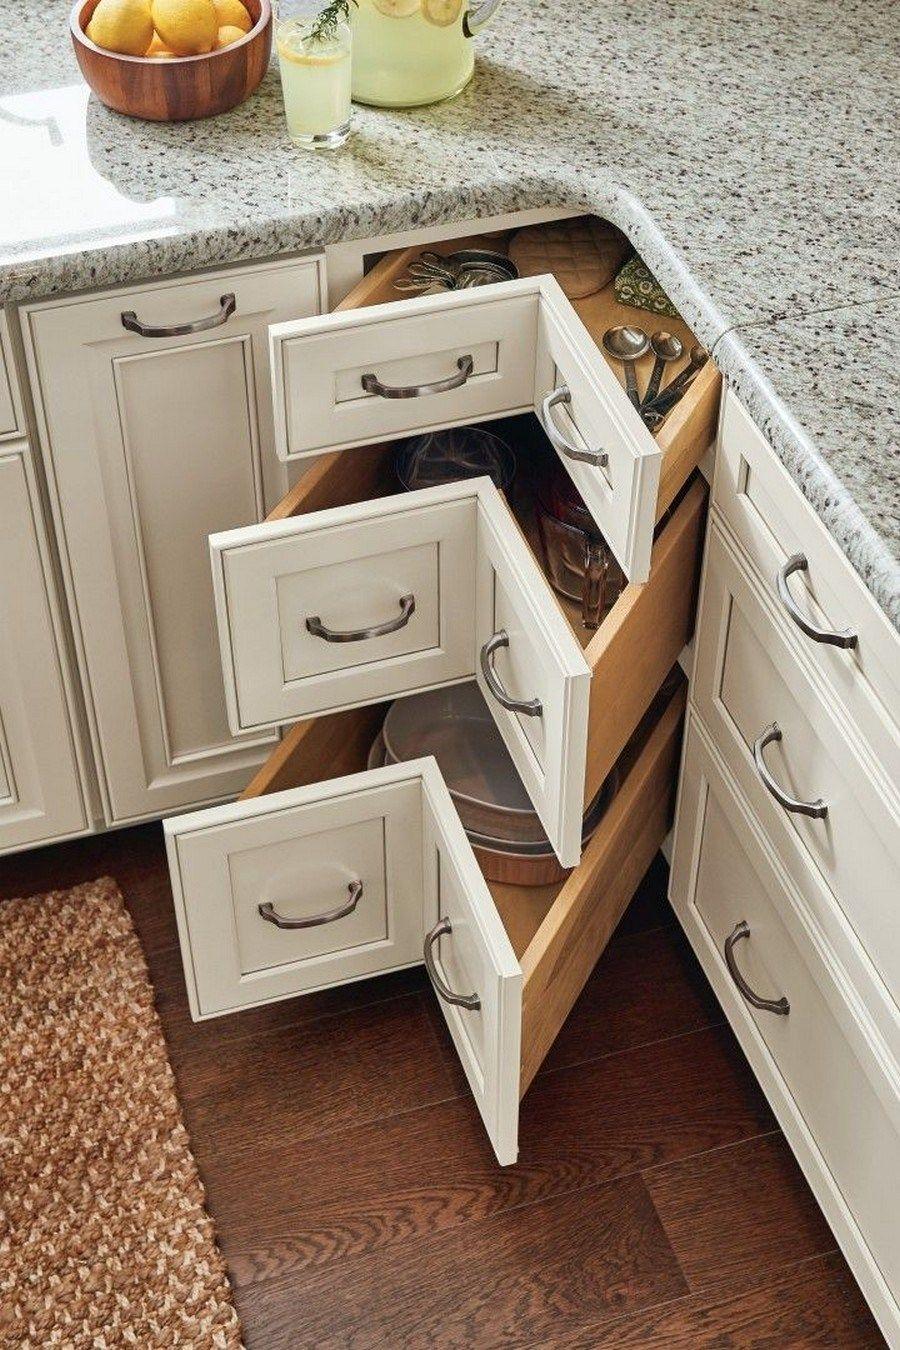 10 brilliant kitchen cabinet organization and tips ideas 5 on brilliant kitchen cabinet organization id=48804